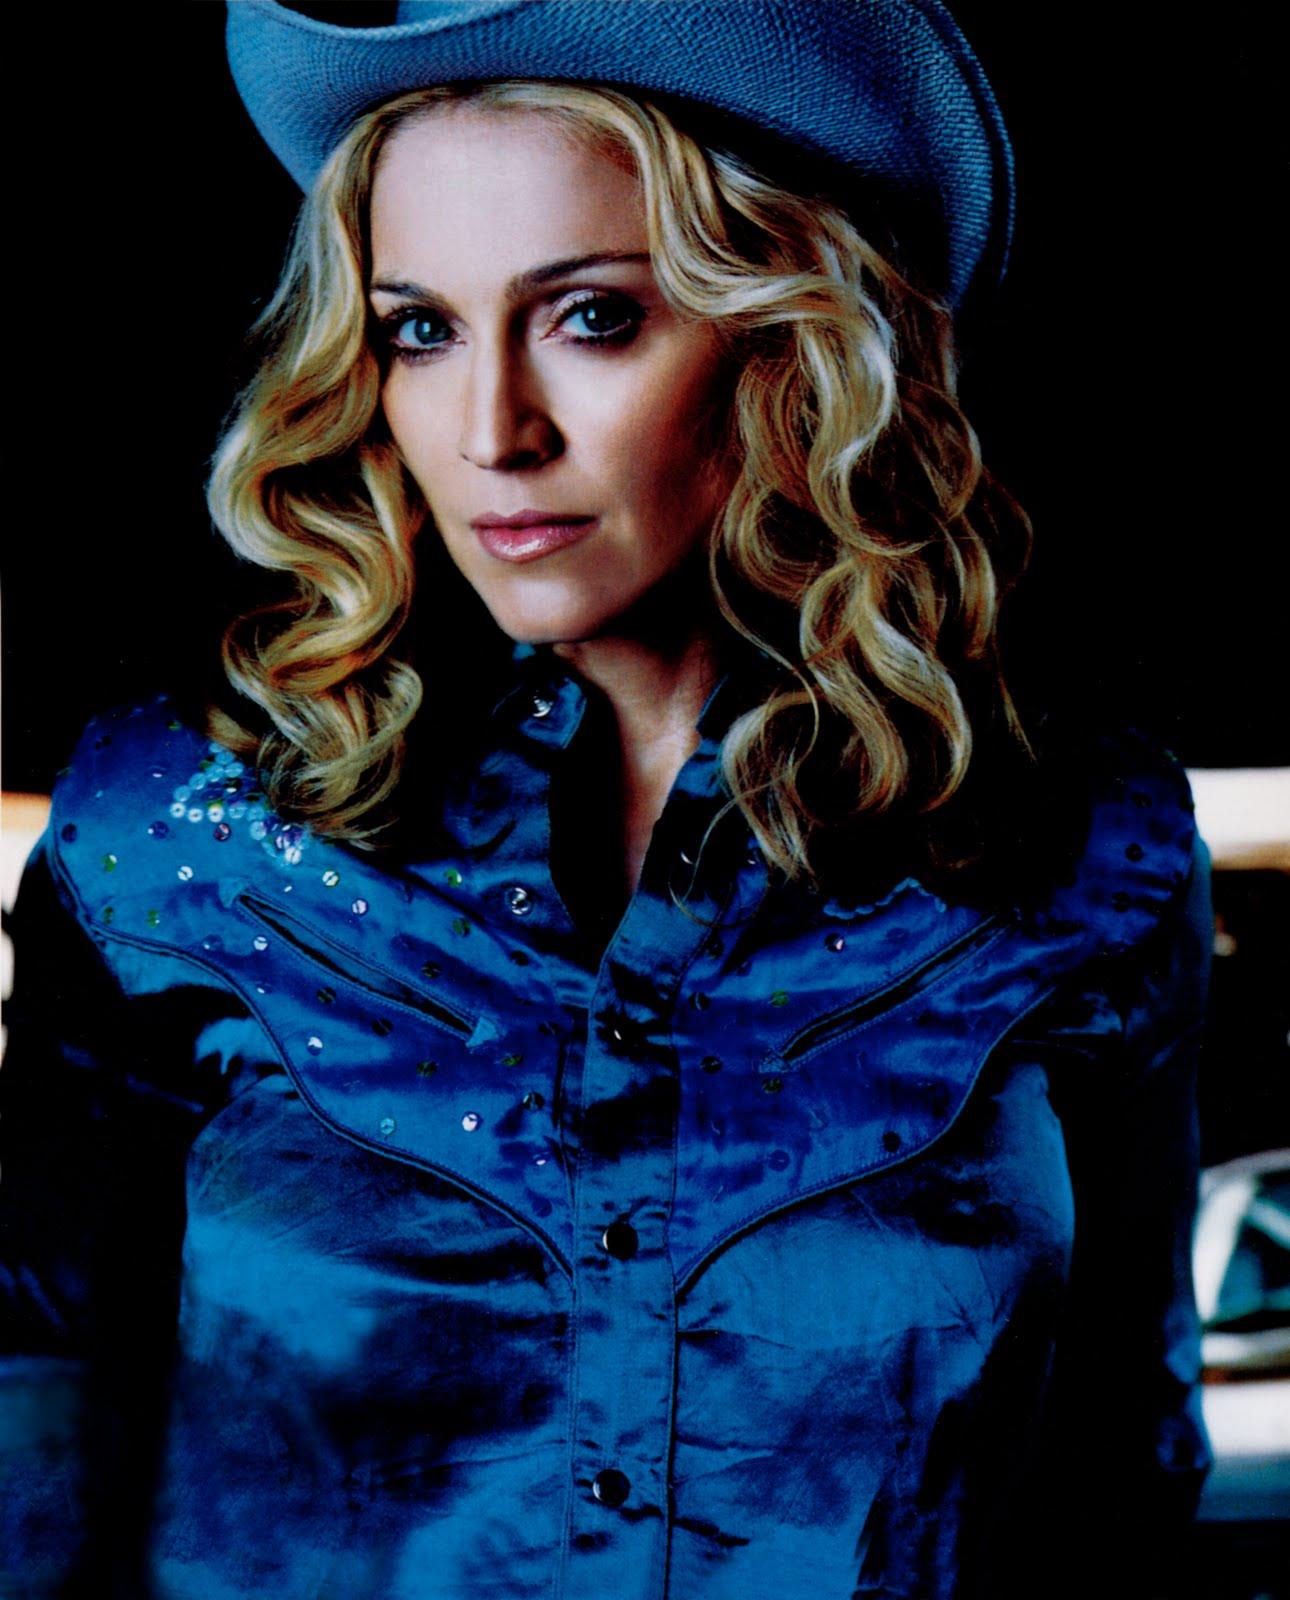 Madonna by Jean-Baptiste Mondino